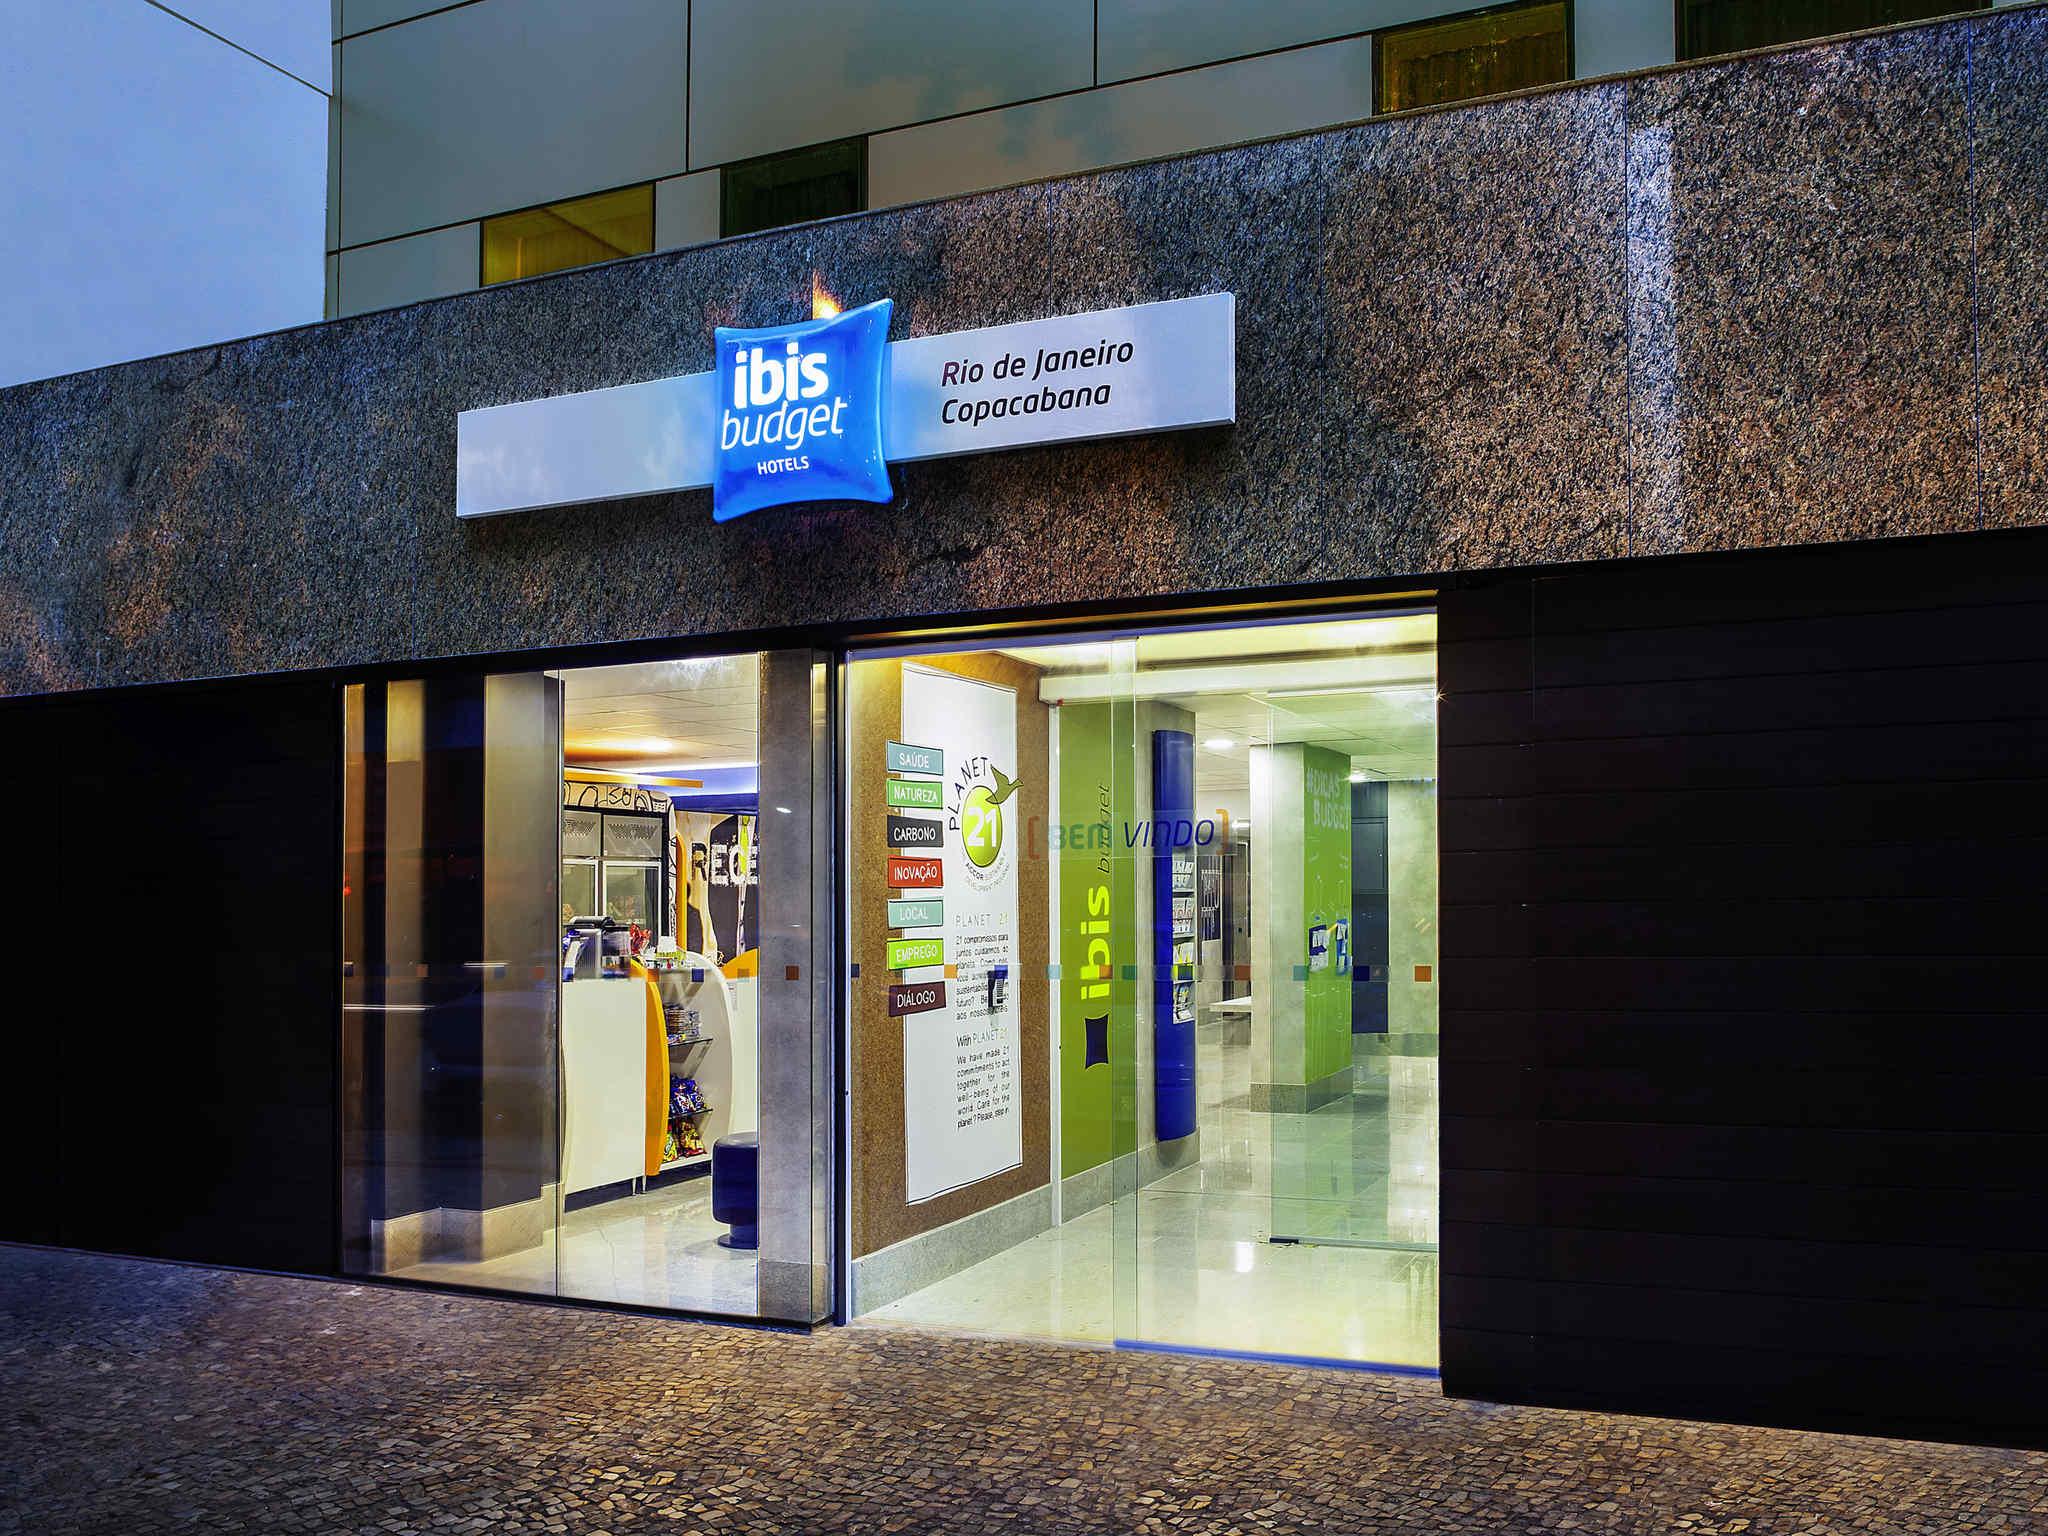 Hotel in rio de janeiro - ibis budget Rj Copacabana